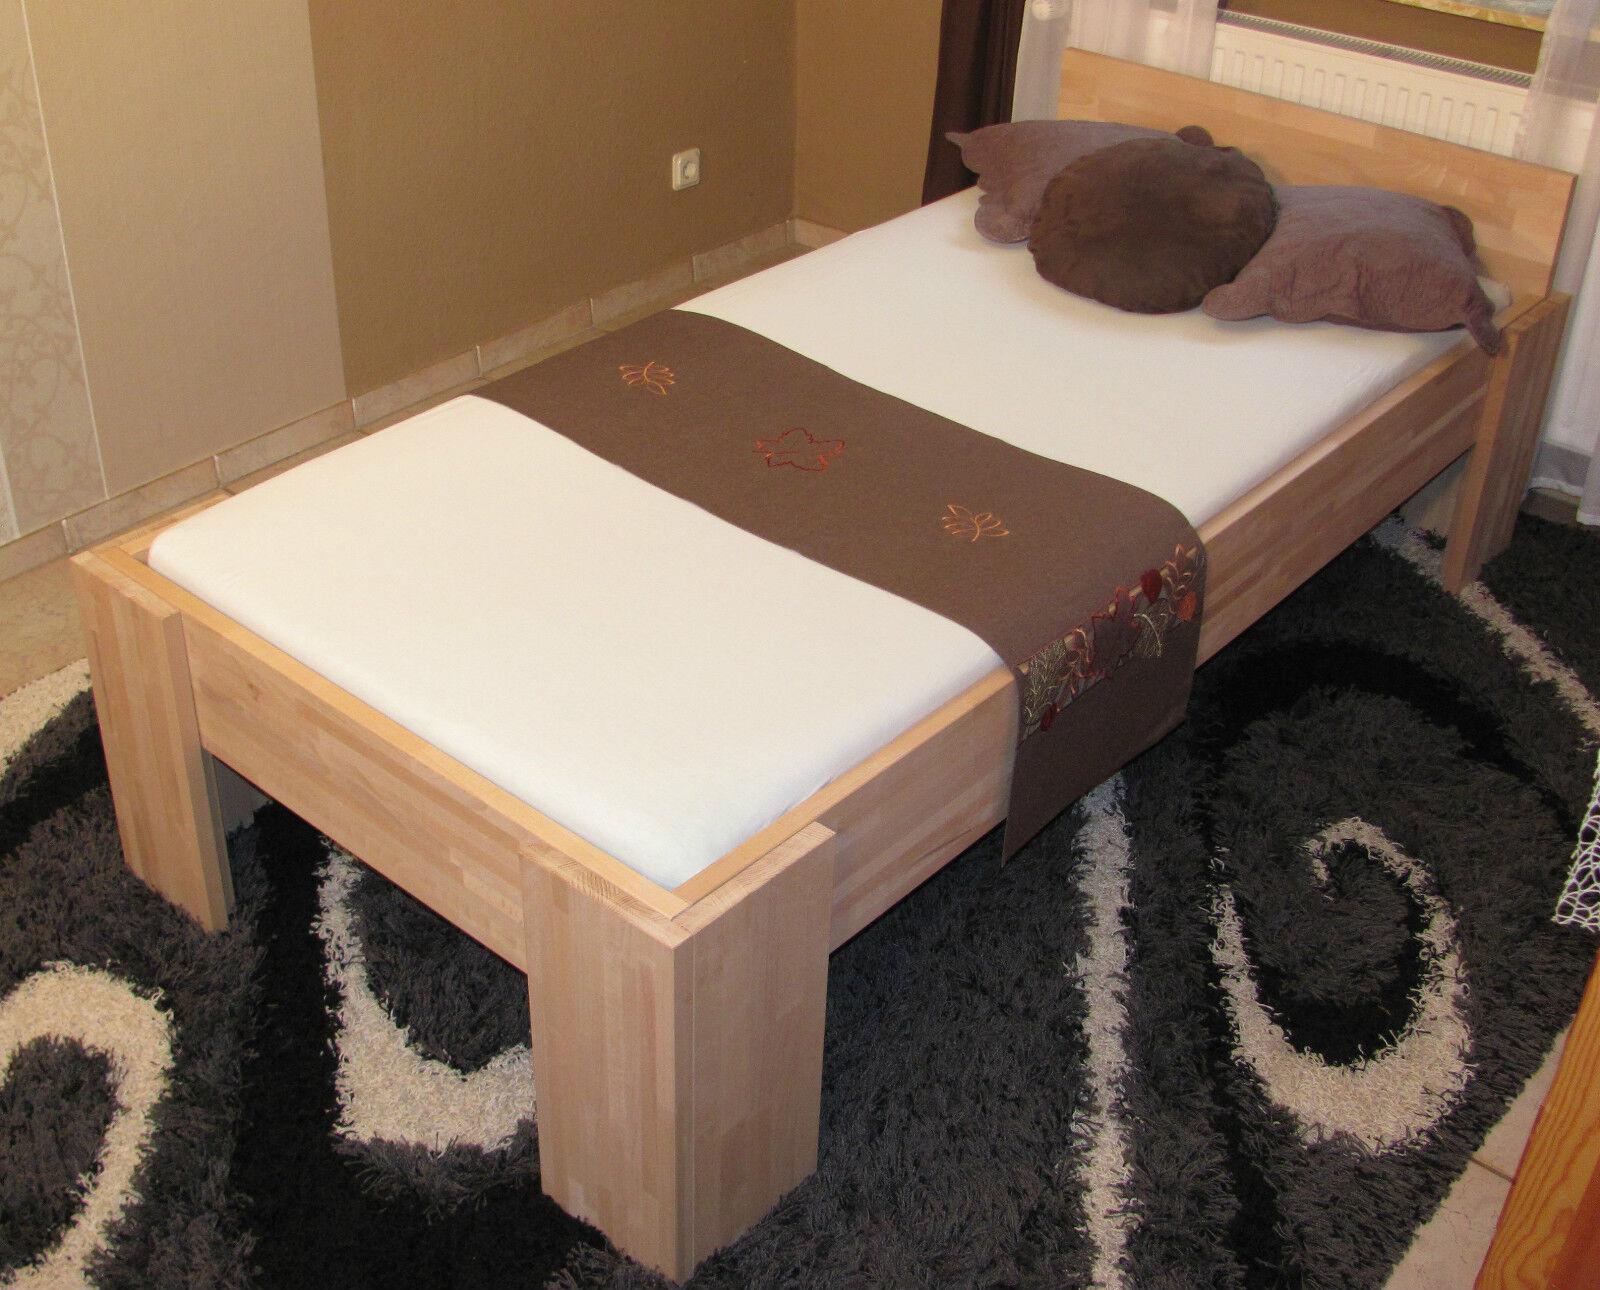 27mm bett vollholz echtholz massivholzbett 100x200 einzelbett buche fu i eur 189 00 picclick de. Black Bedroom Furniture Sets. Home Design Ideas